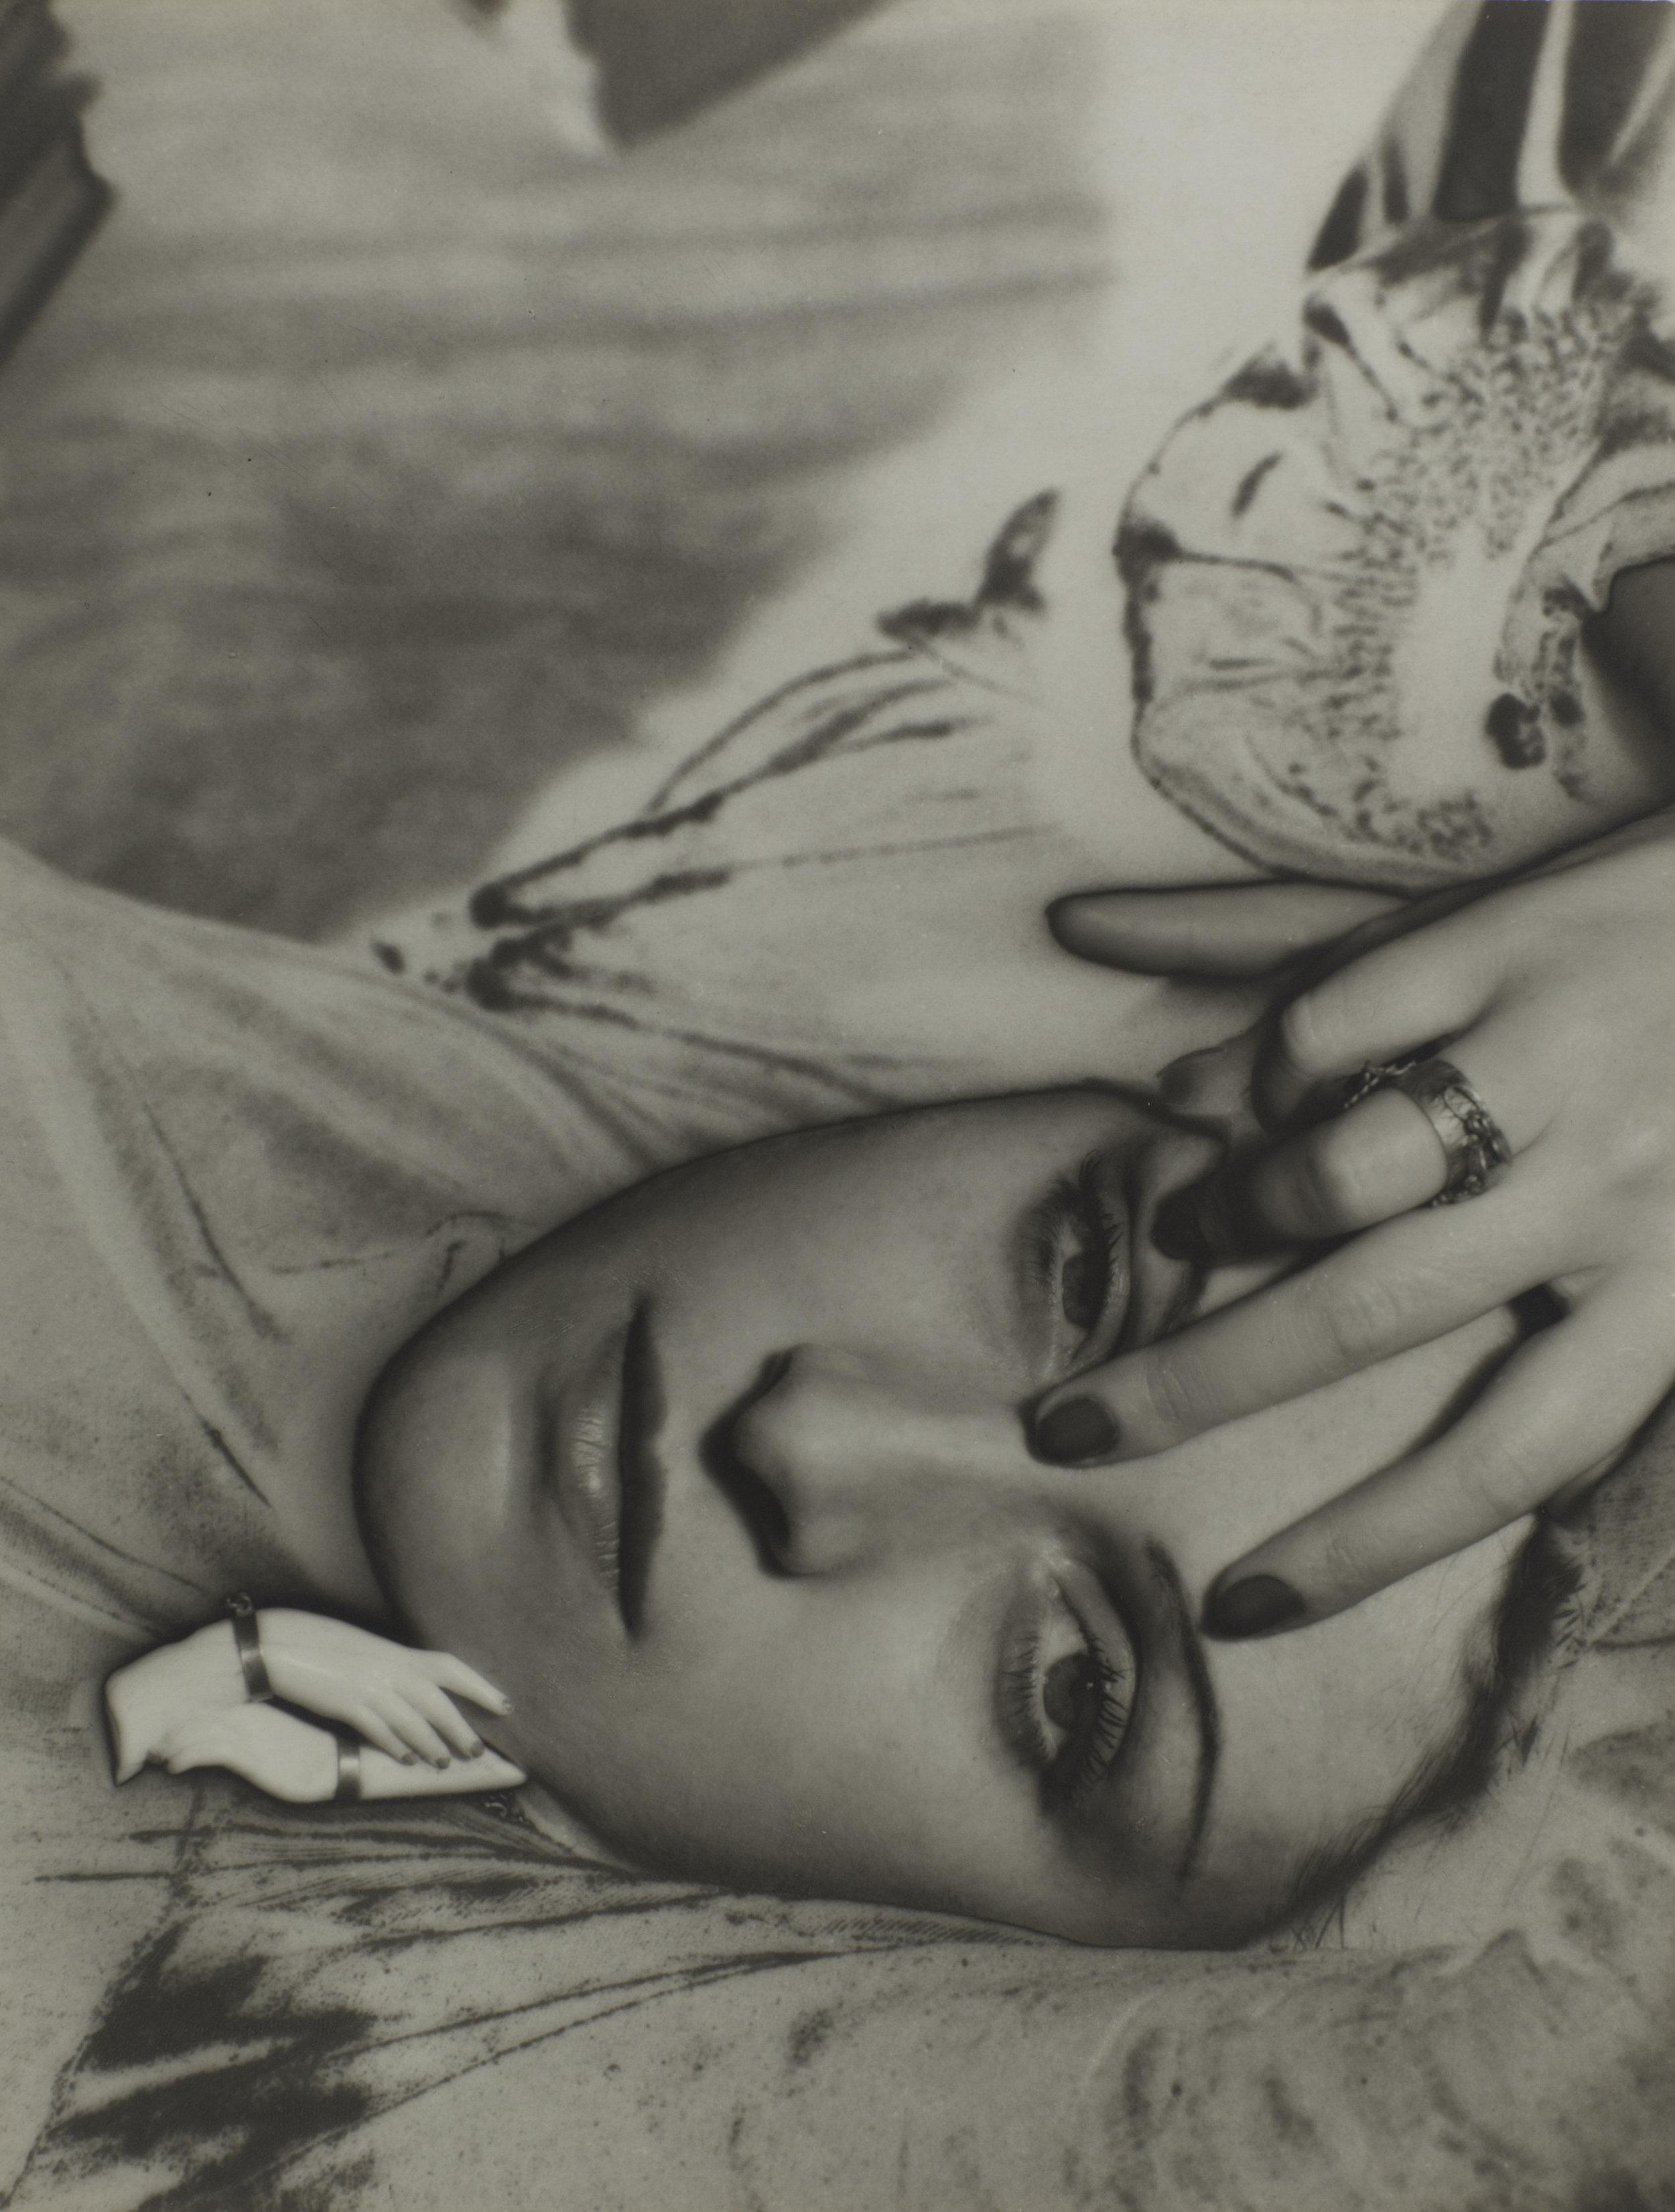 Man Ray 1890-1976, Dora Maar ,1936,Photograph, gelatin silver print on paper,165 x 215 mm,The Sir Elton John Photography Collection,© Man Ray Trust/ADAGP, Paris and DACS, London 2016.